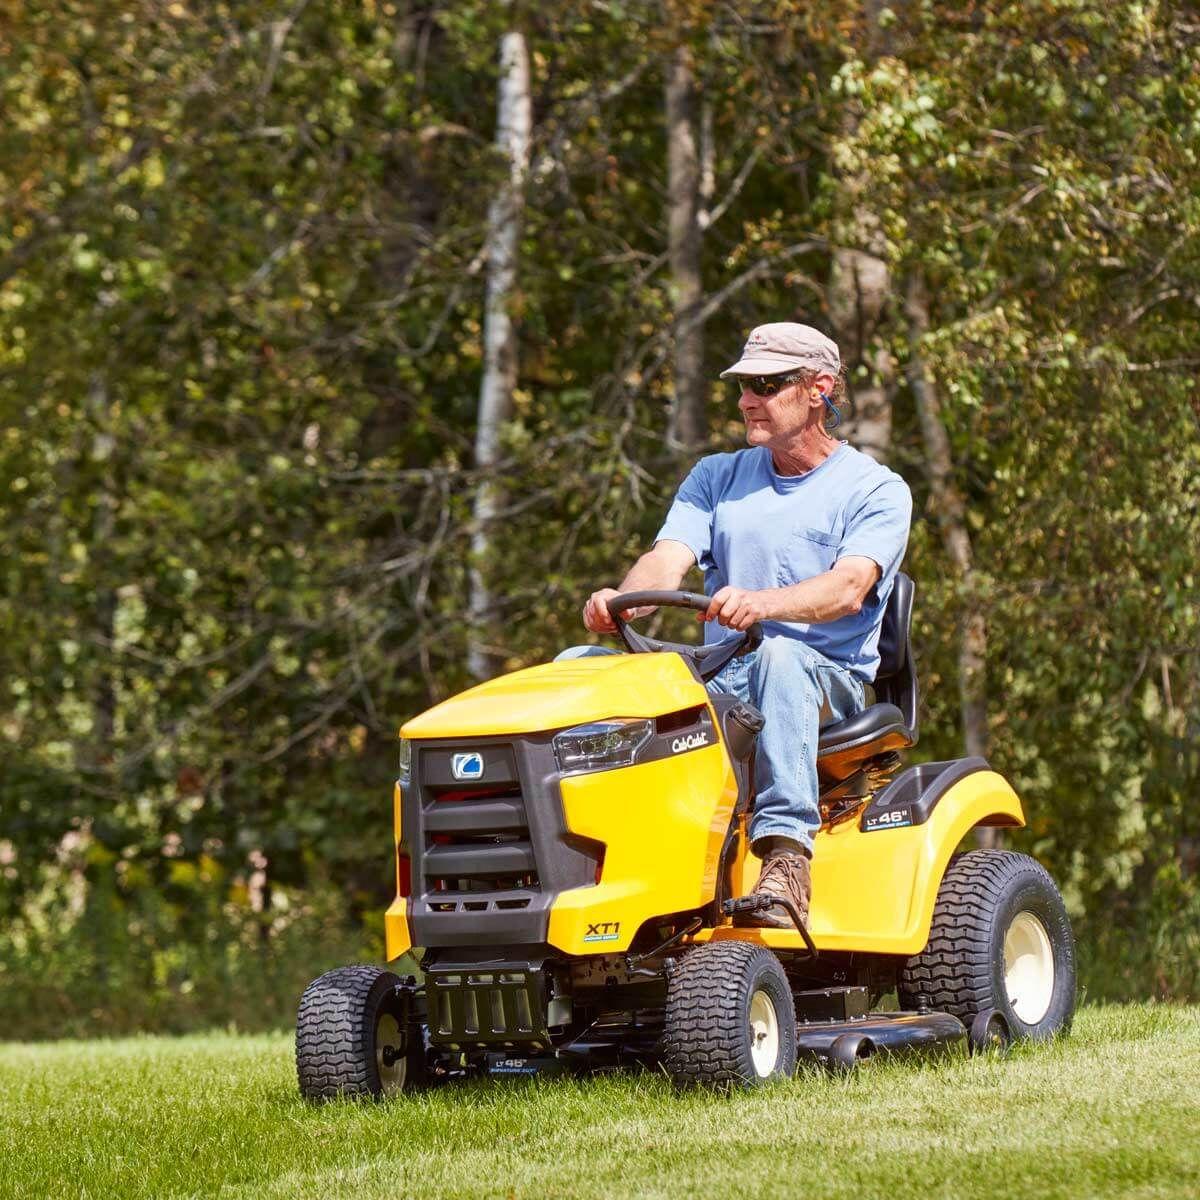 2018 Best in DIY: Lawn Tractors   The Backyard & Garden   Pinterest ...